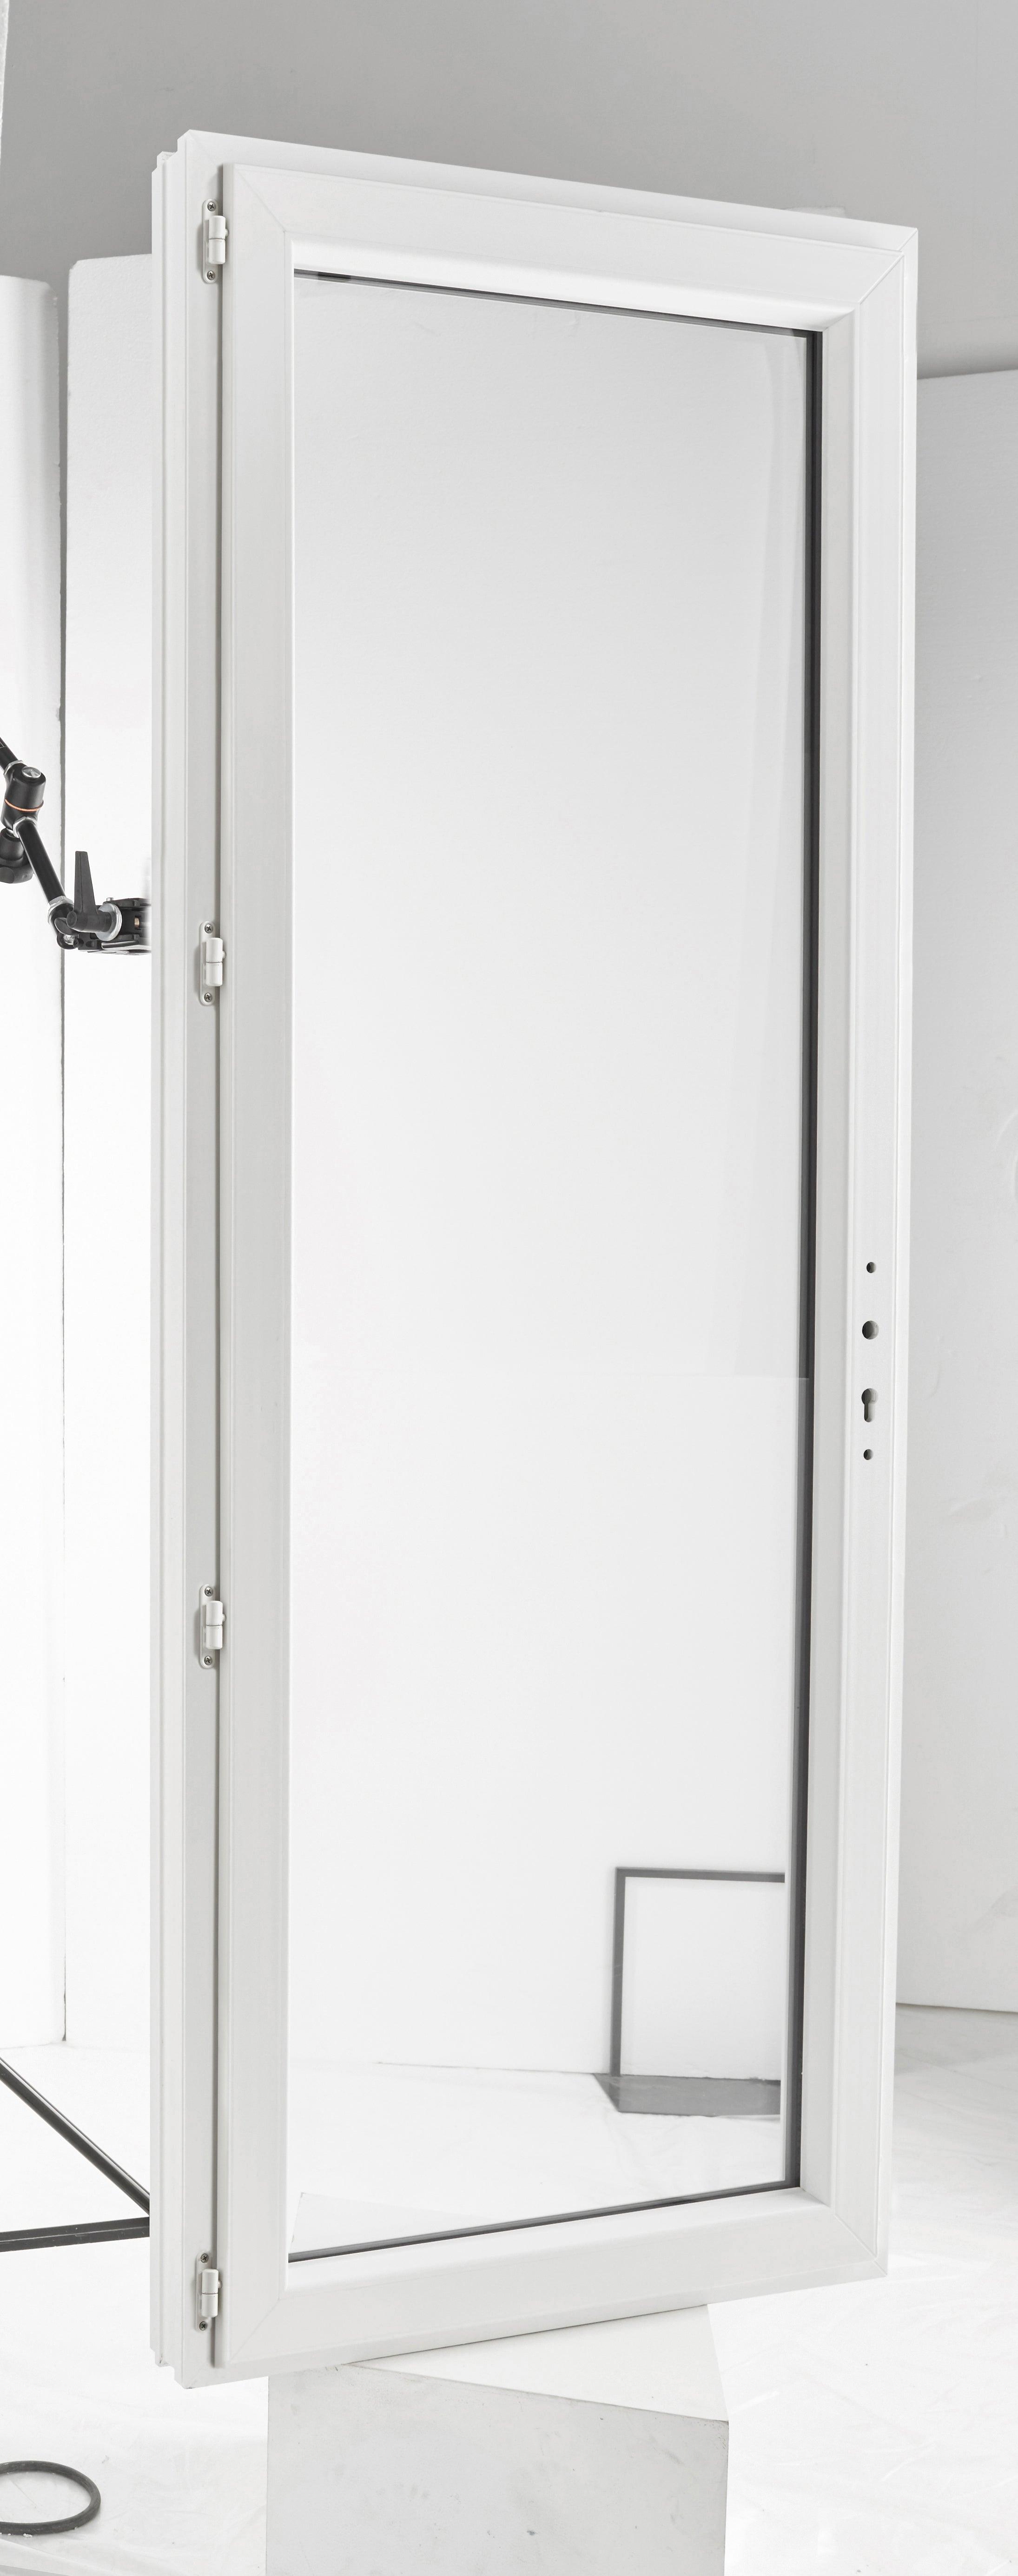 Porte Fenetre Pvc Brico Essentiel Blanc H 215 X L 90 Cm 1 Vantail Tirant Gauche Leroy Merlin